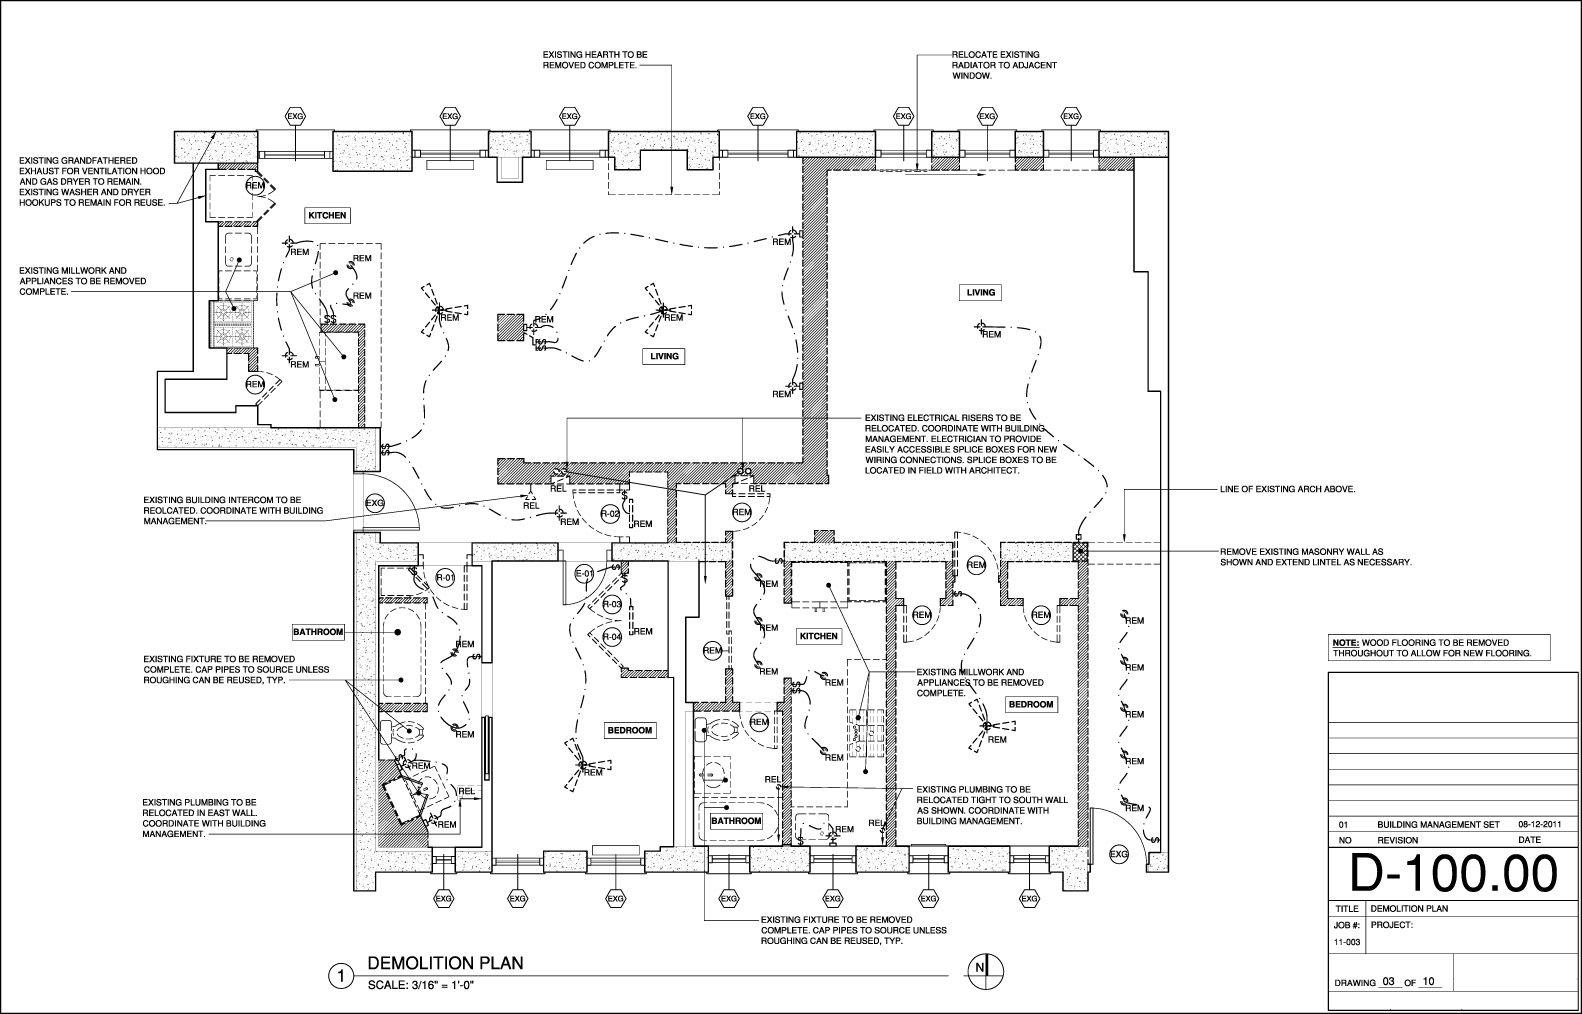 Demolition Plan Template